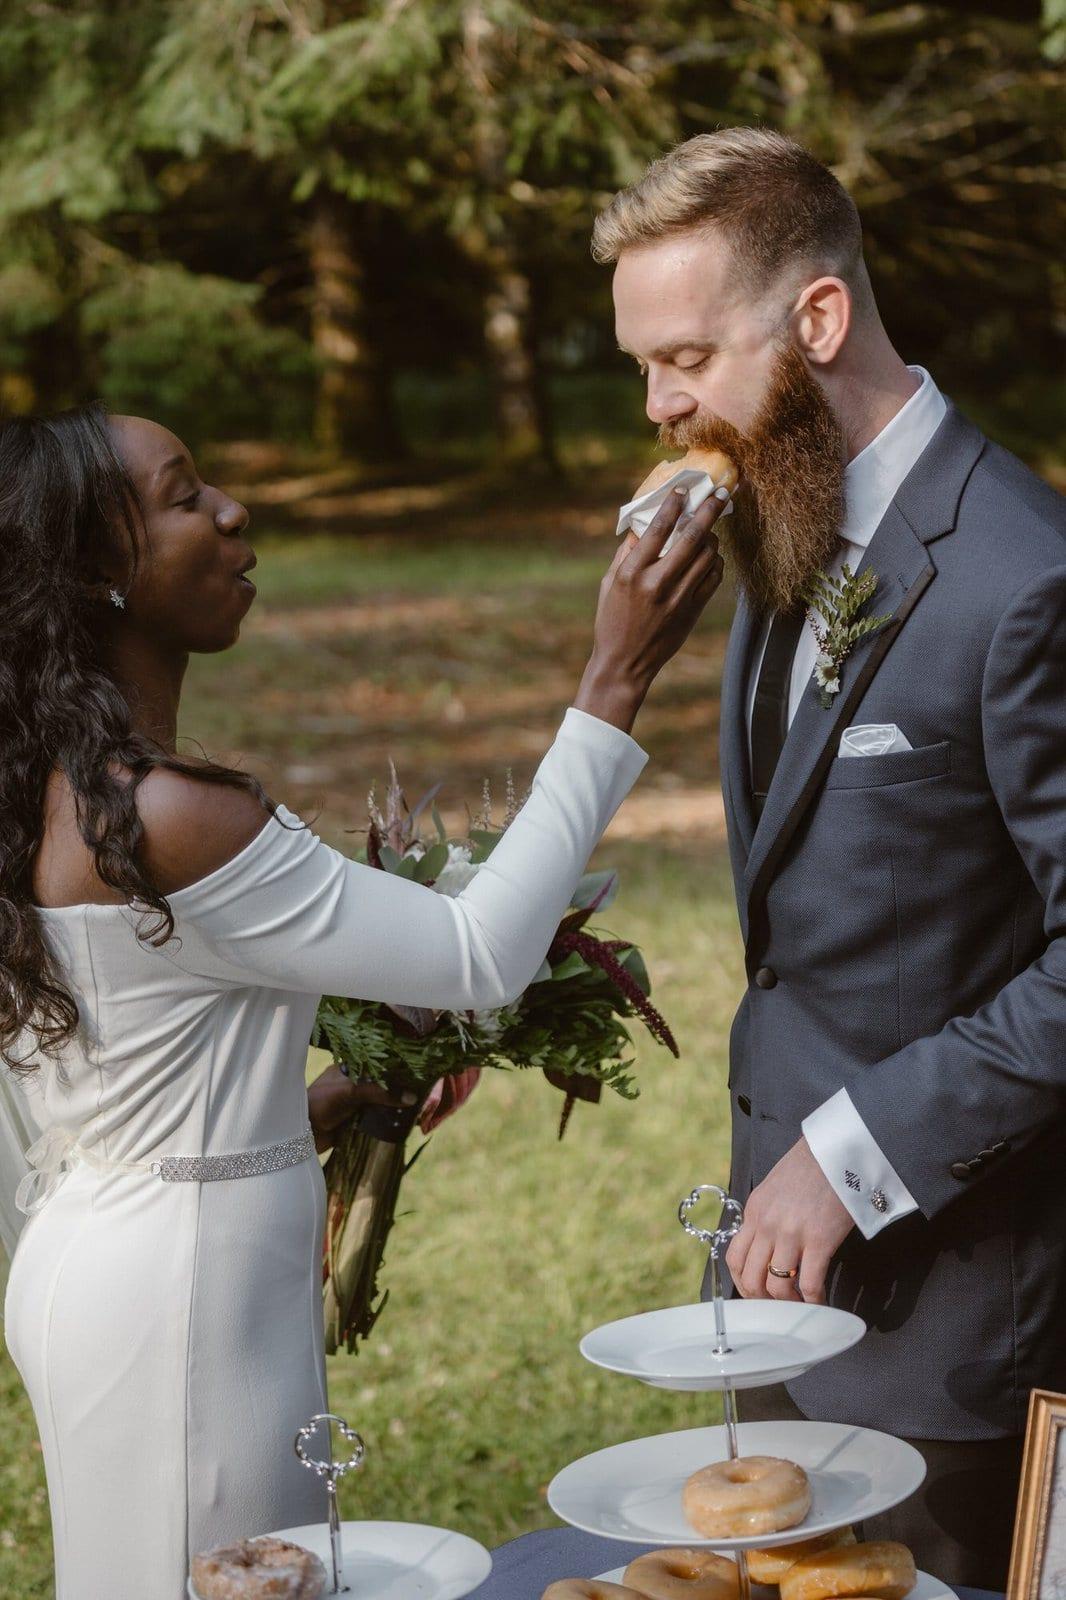 Bride feeds groom donuts at wedding.